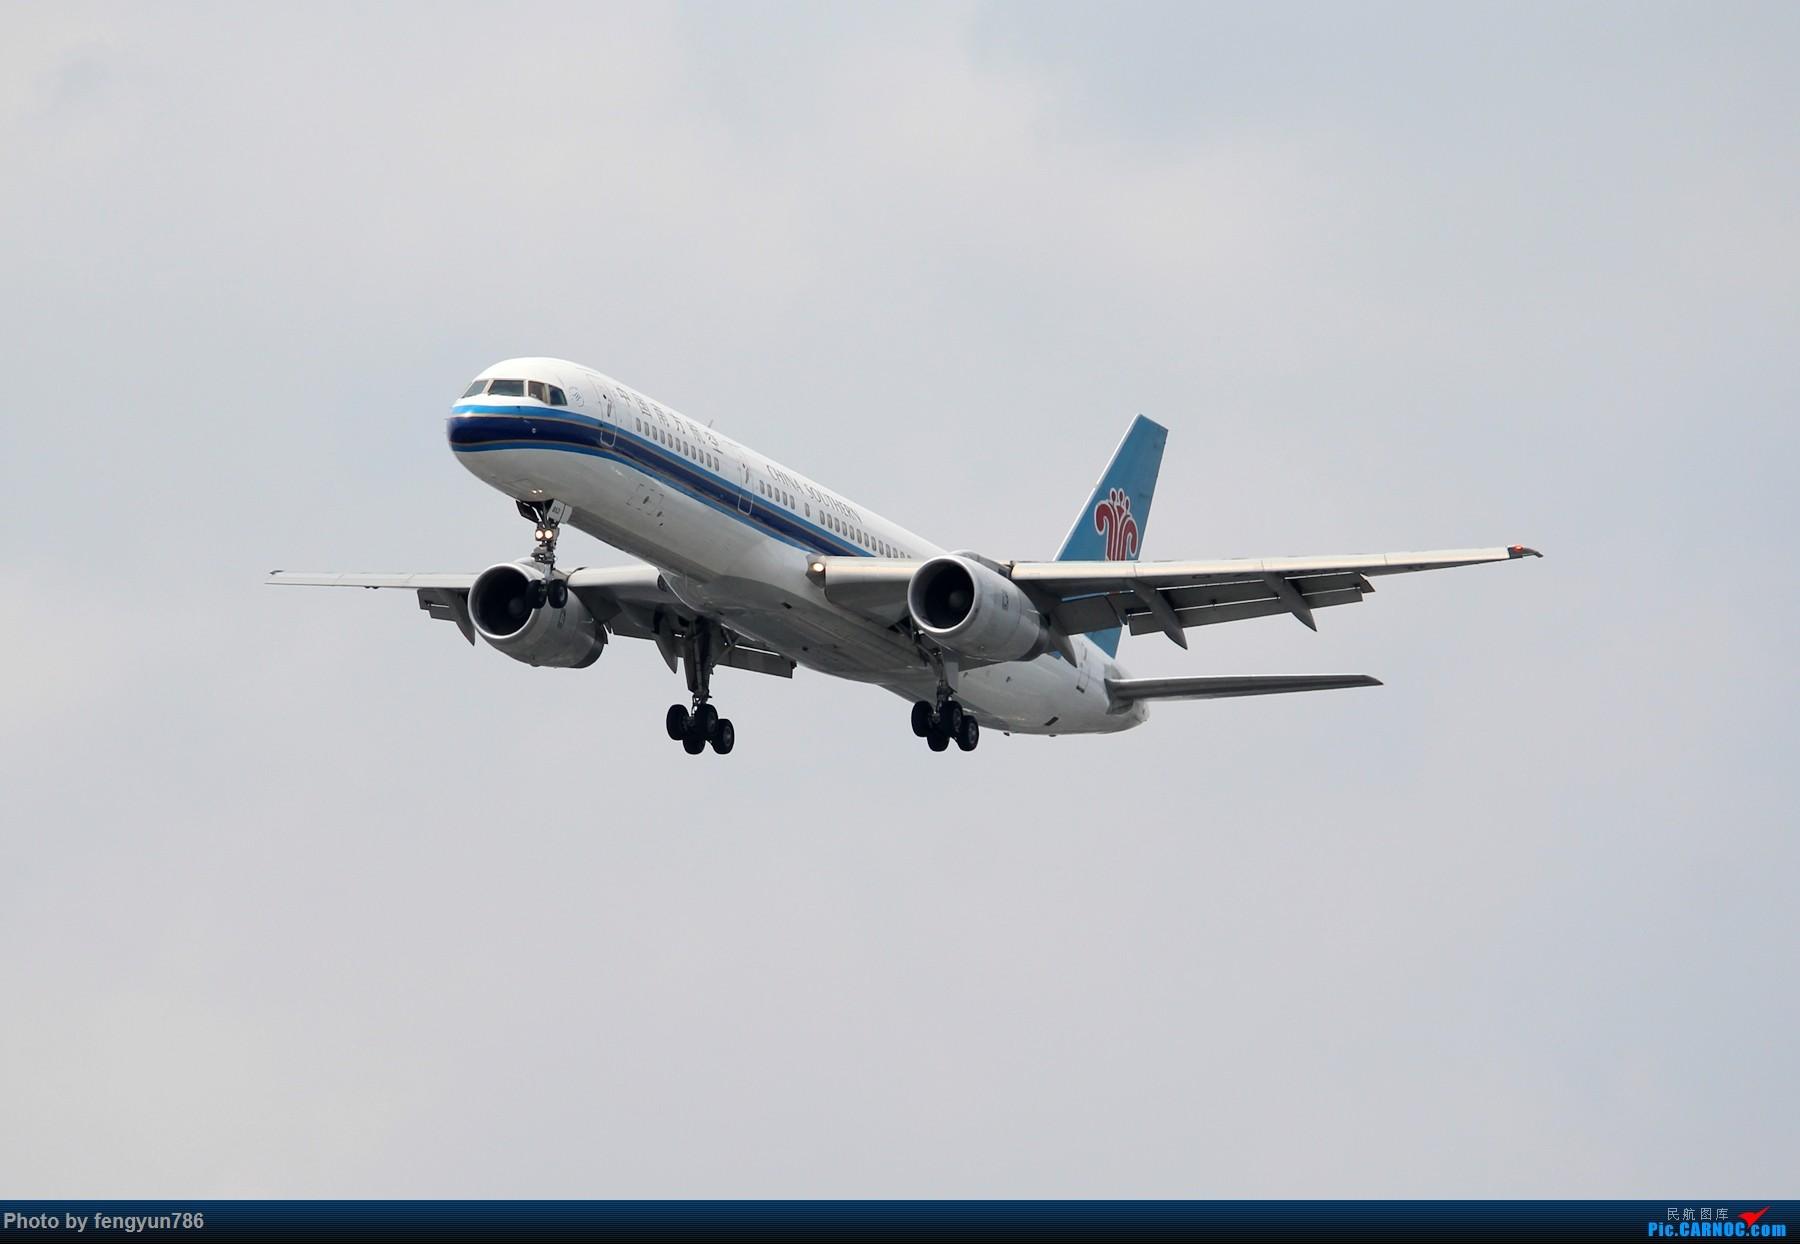 Re:[原创]7.19的SHA,天晴温高,发几个跟前一天不一样的。 BOEING 757-200 B-2853 中国上海虹桥国际机场